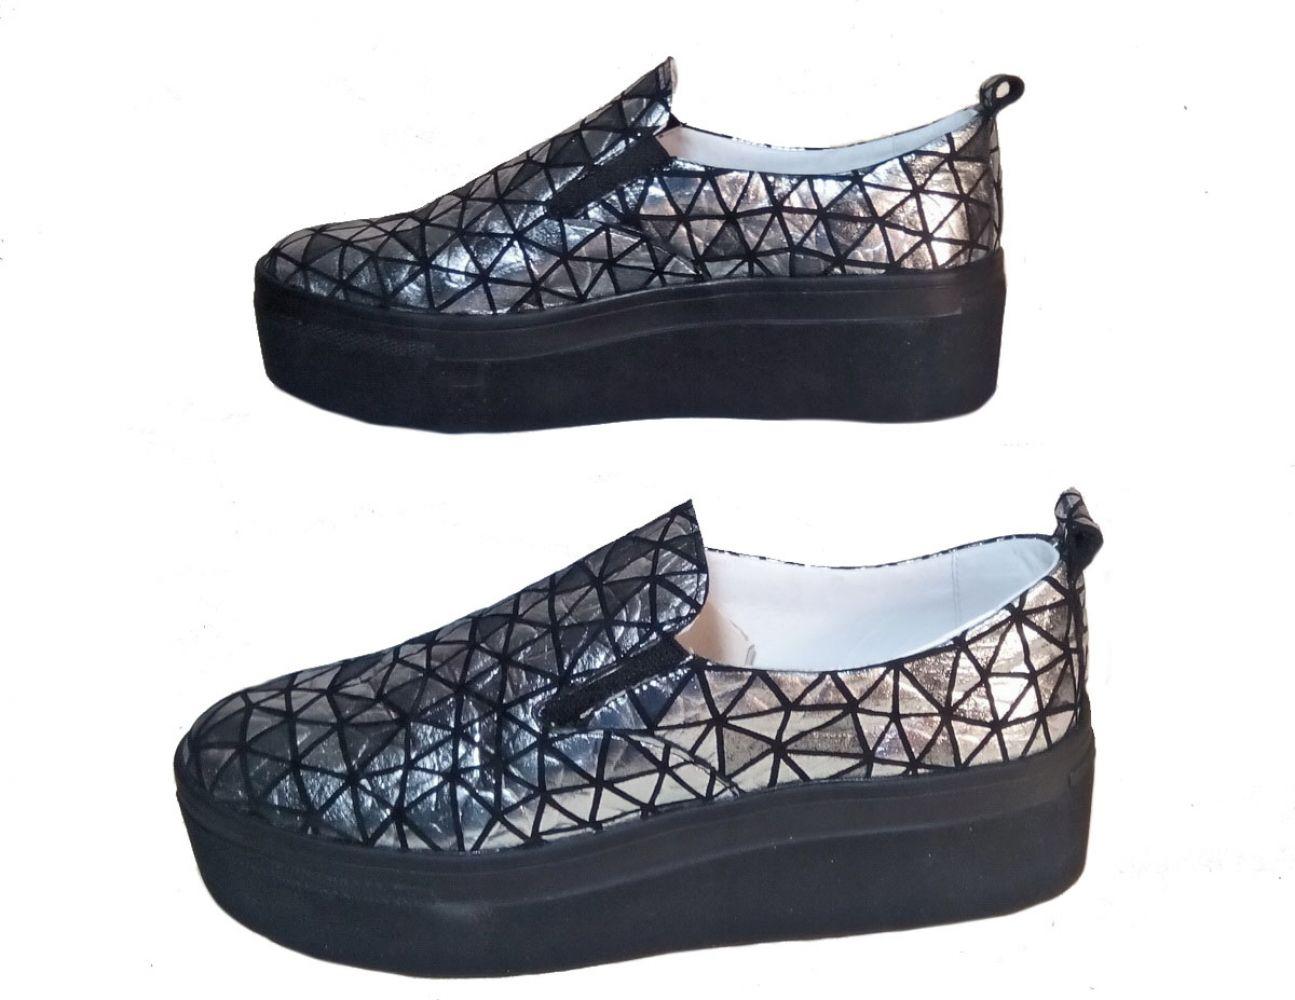 1cb54d3e3 Слипоны женские Discount Shoes 3D Черная подошва, 3D серебряный верх ...